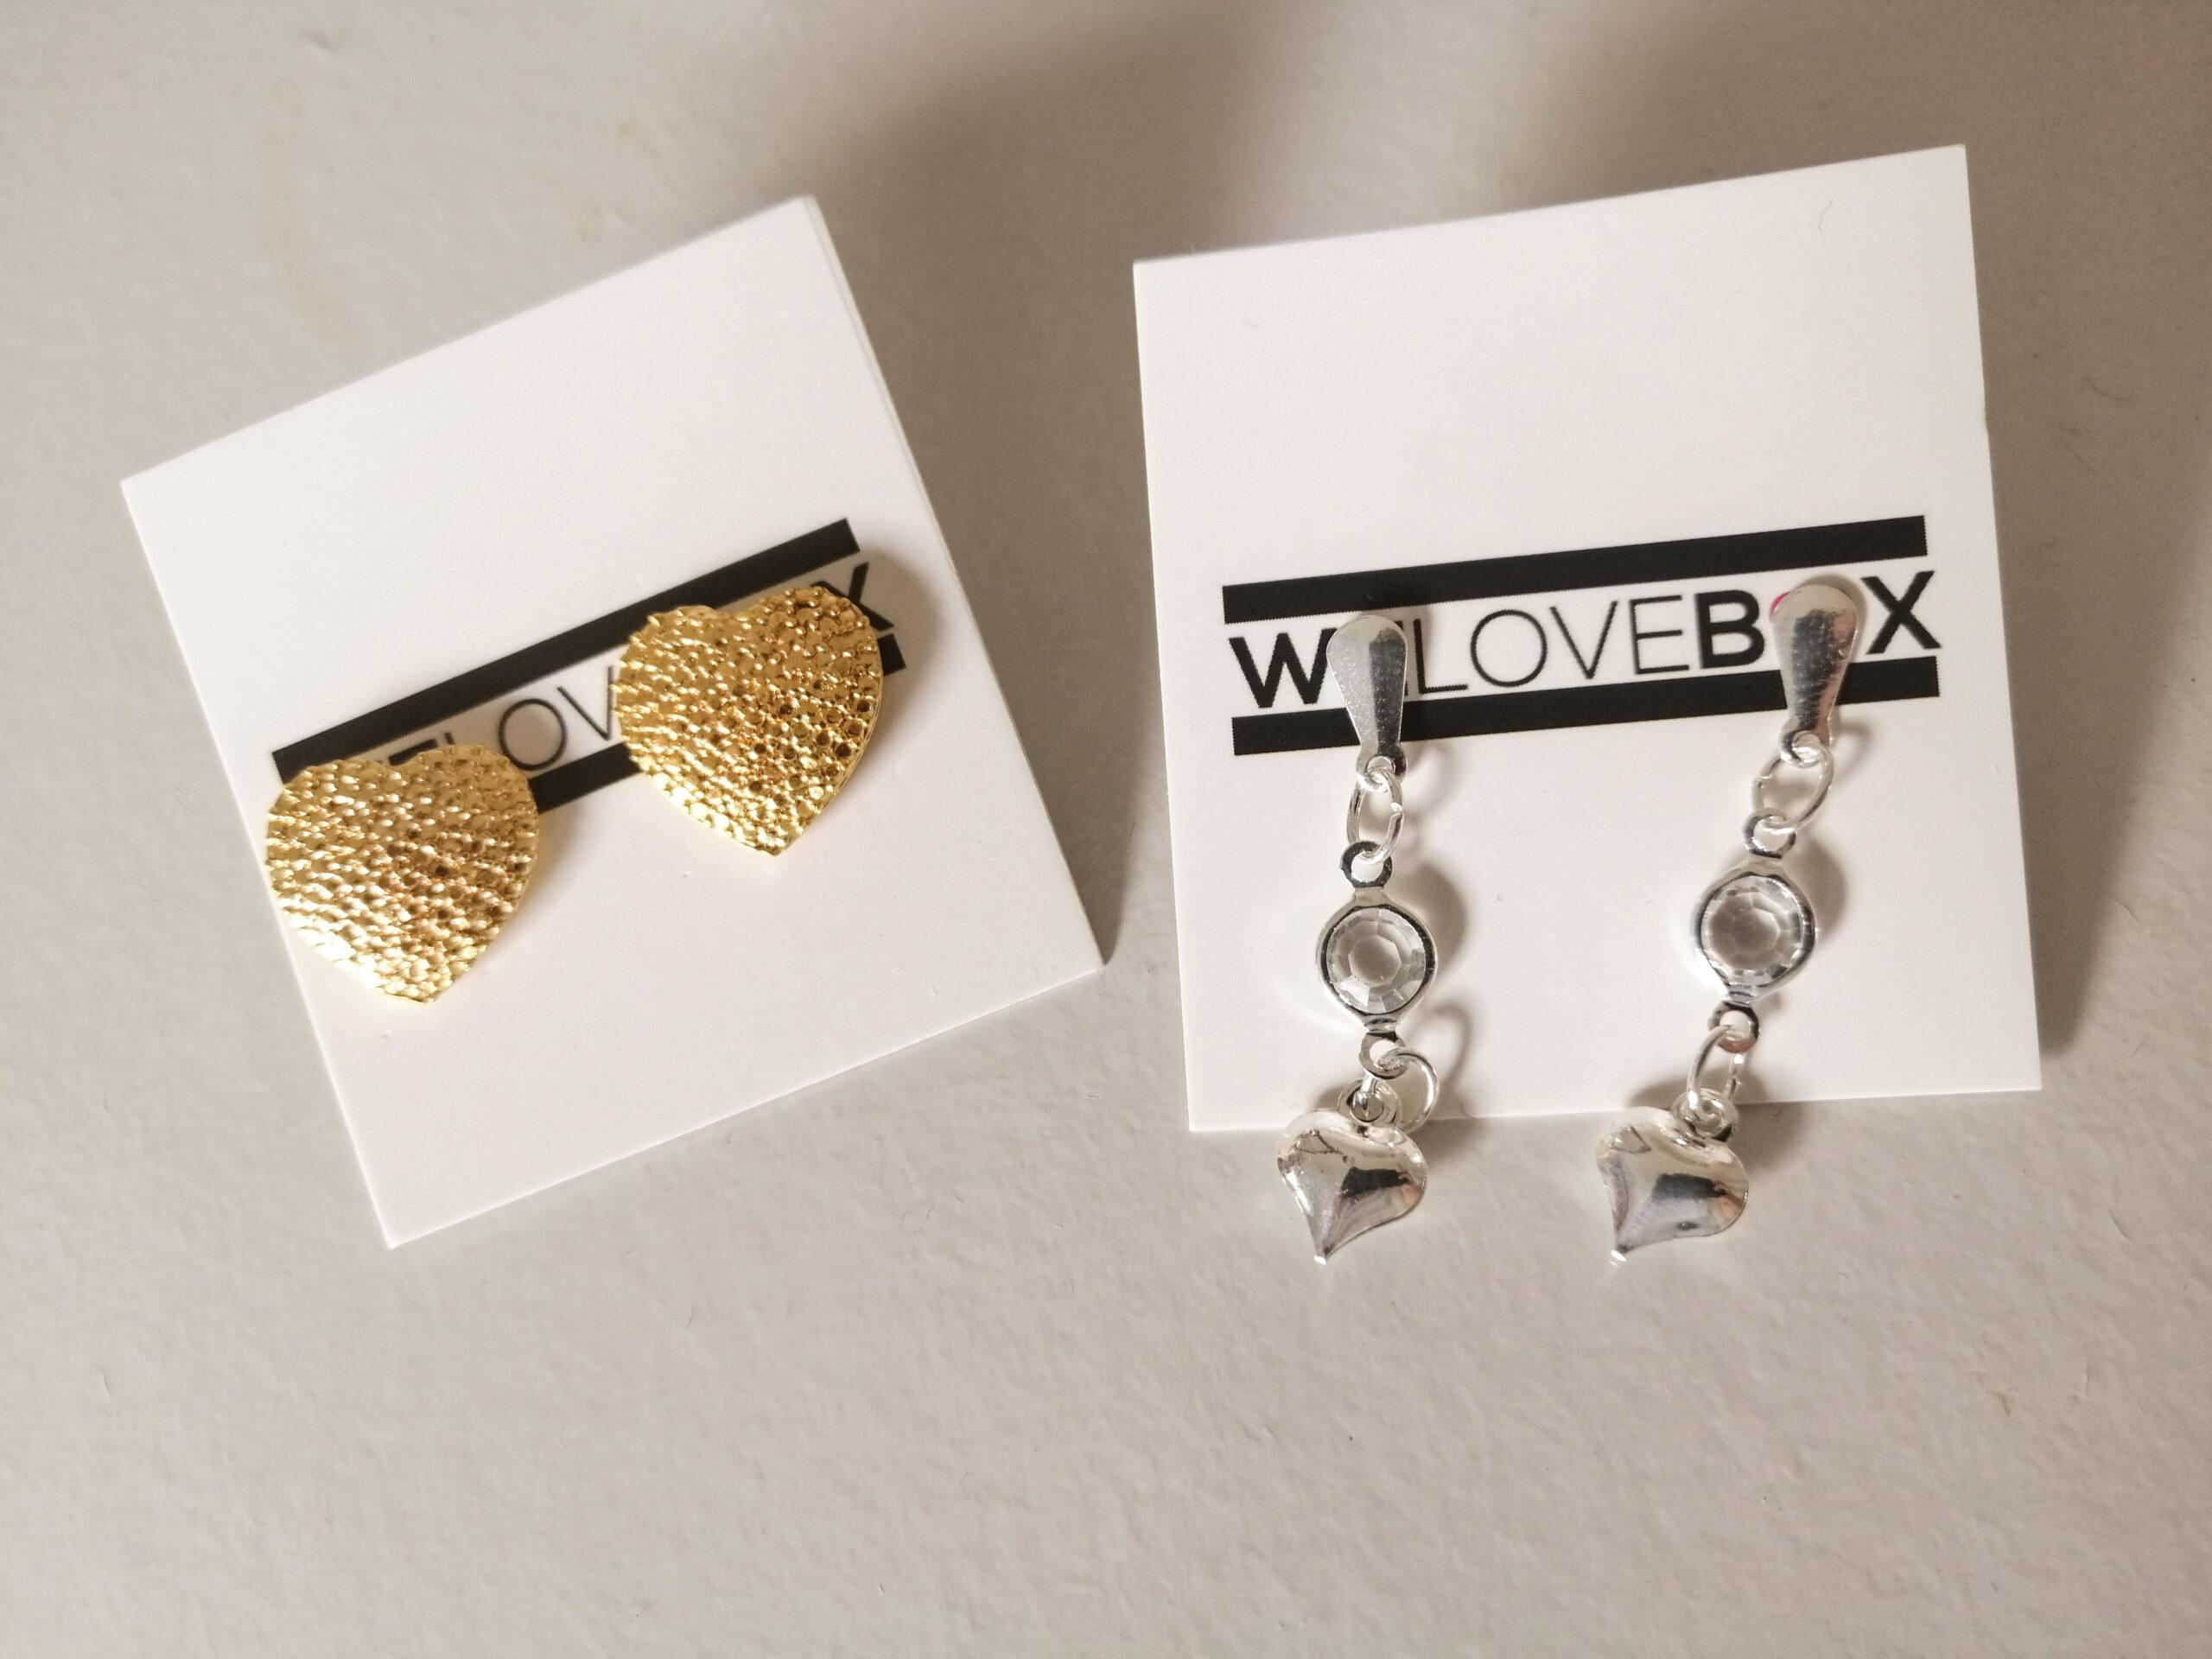 we love box